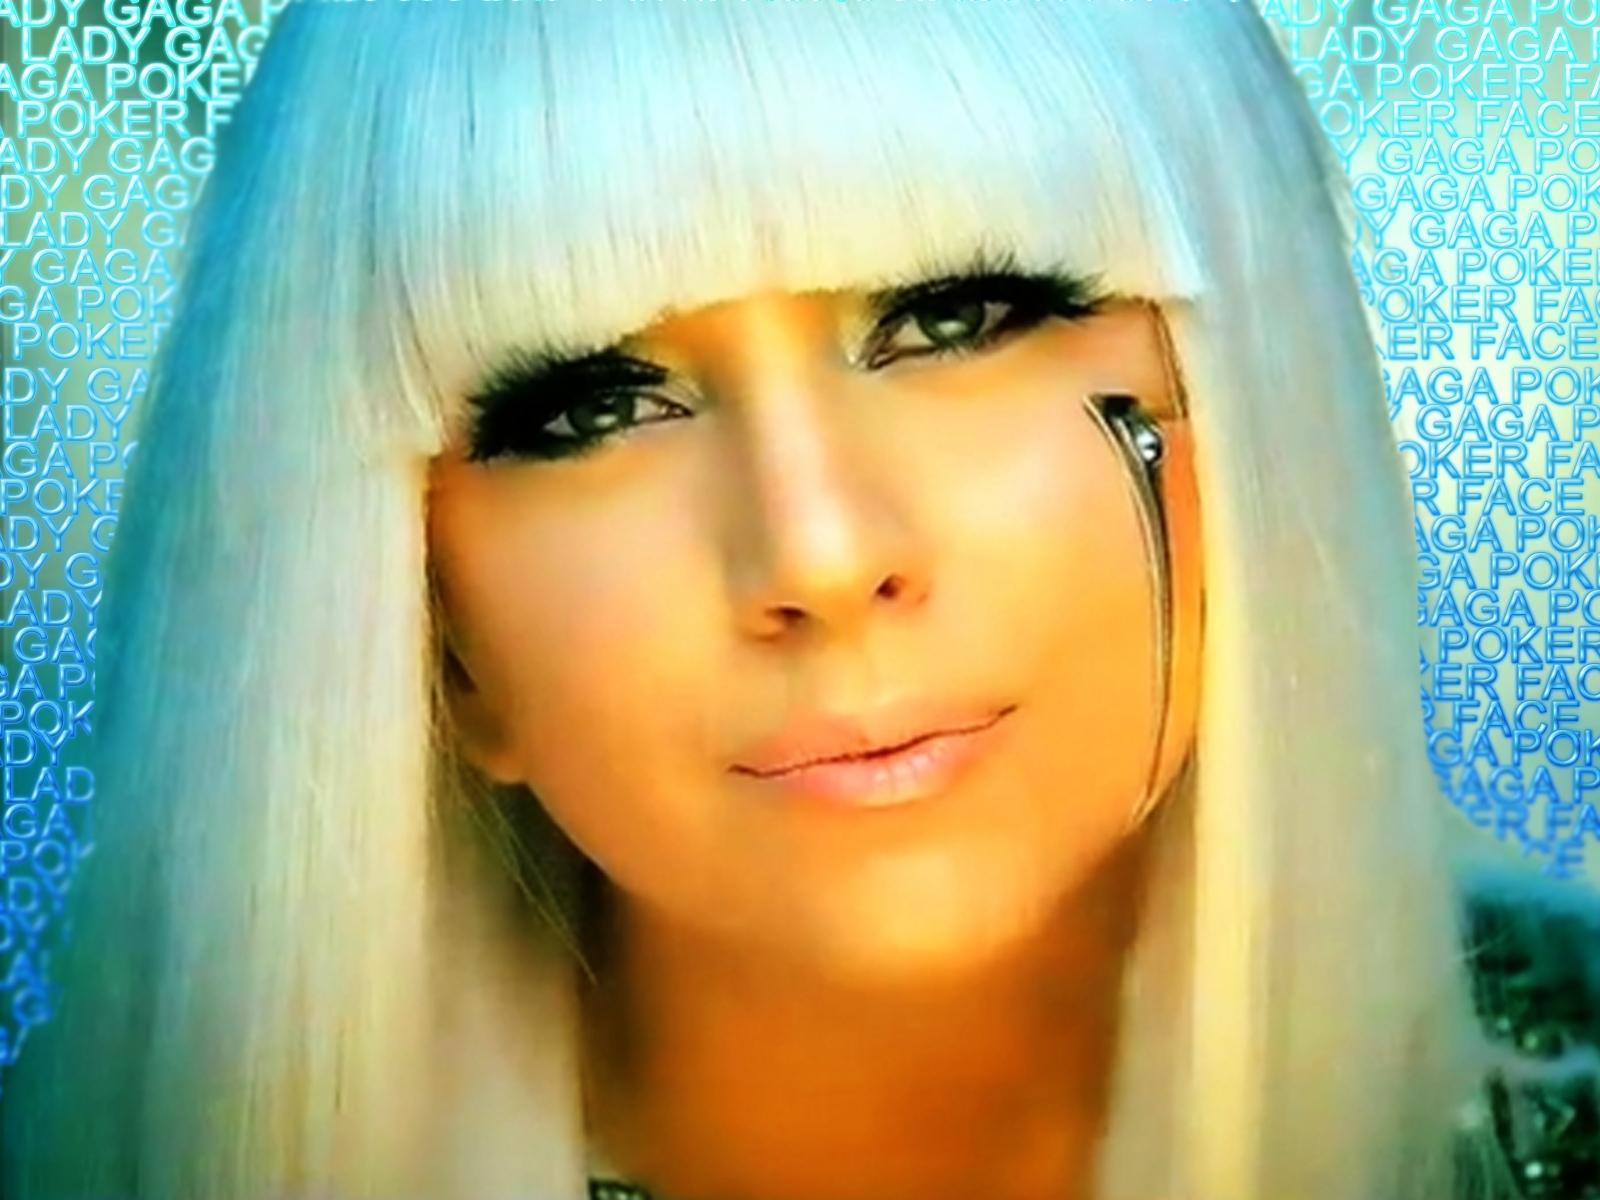 http://3.bp.blogspot.com/-5wh7N2KHhBI/TjULDLQTfII/AAAAAAAAADQ/qmR5EDA78VM/s1600/Gaga%2BWallpapers%2B%25252817%252529.jpg